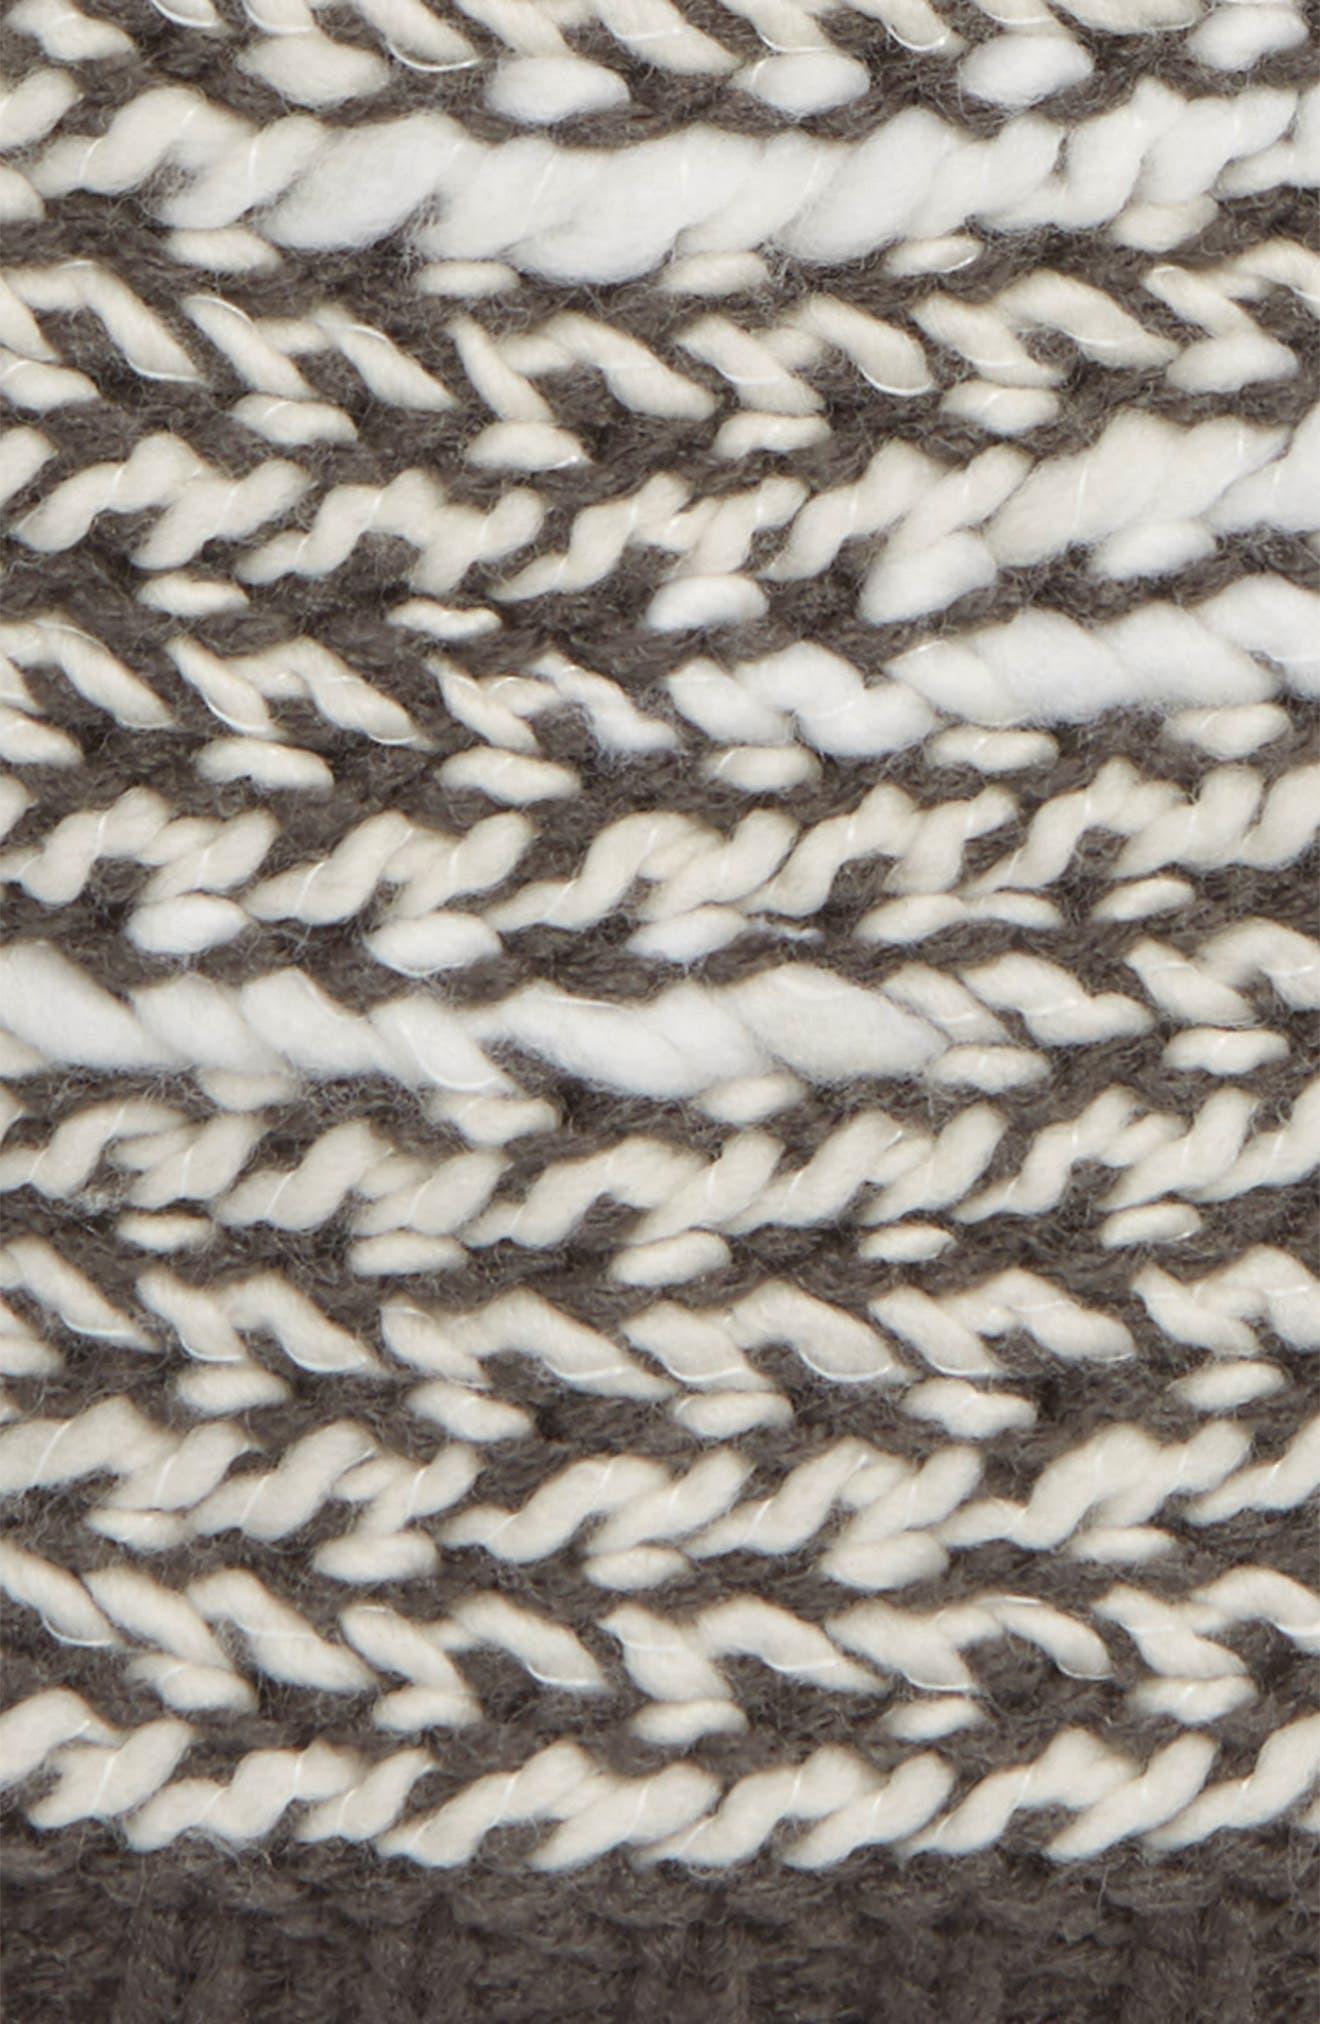 Kaylinda Slouchy Beanie,                             Alternate thumbnail 2, color,                             WEATHERED BLACK/ VINTAGE WHITE